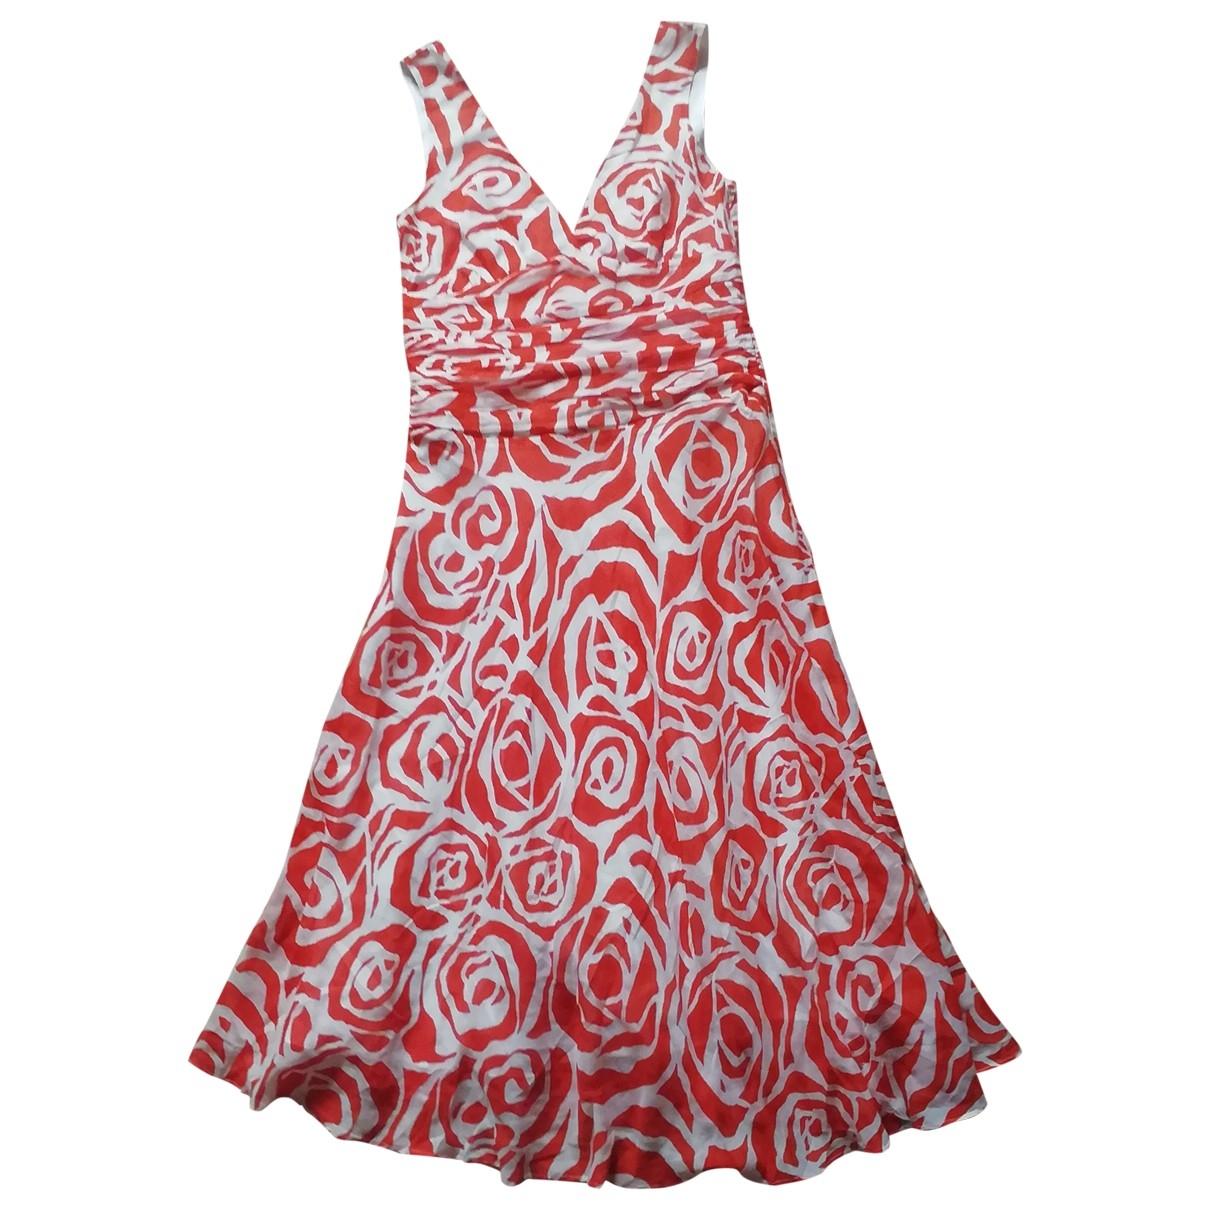 Zara \N Orange Cotton dress for Women M International